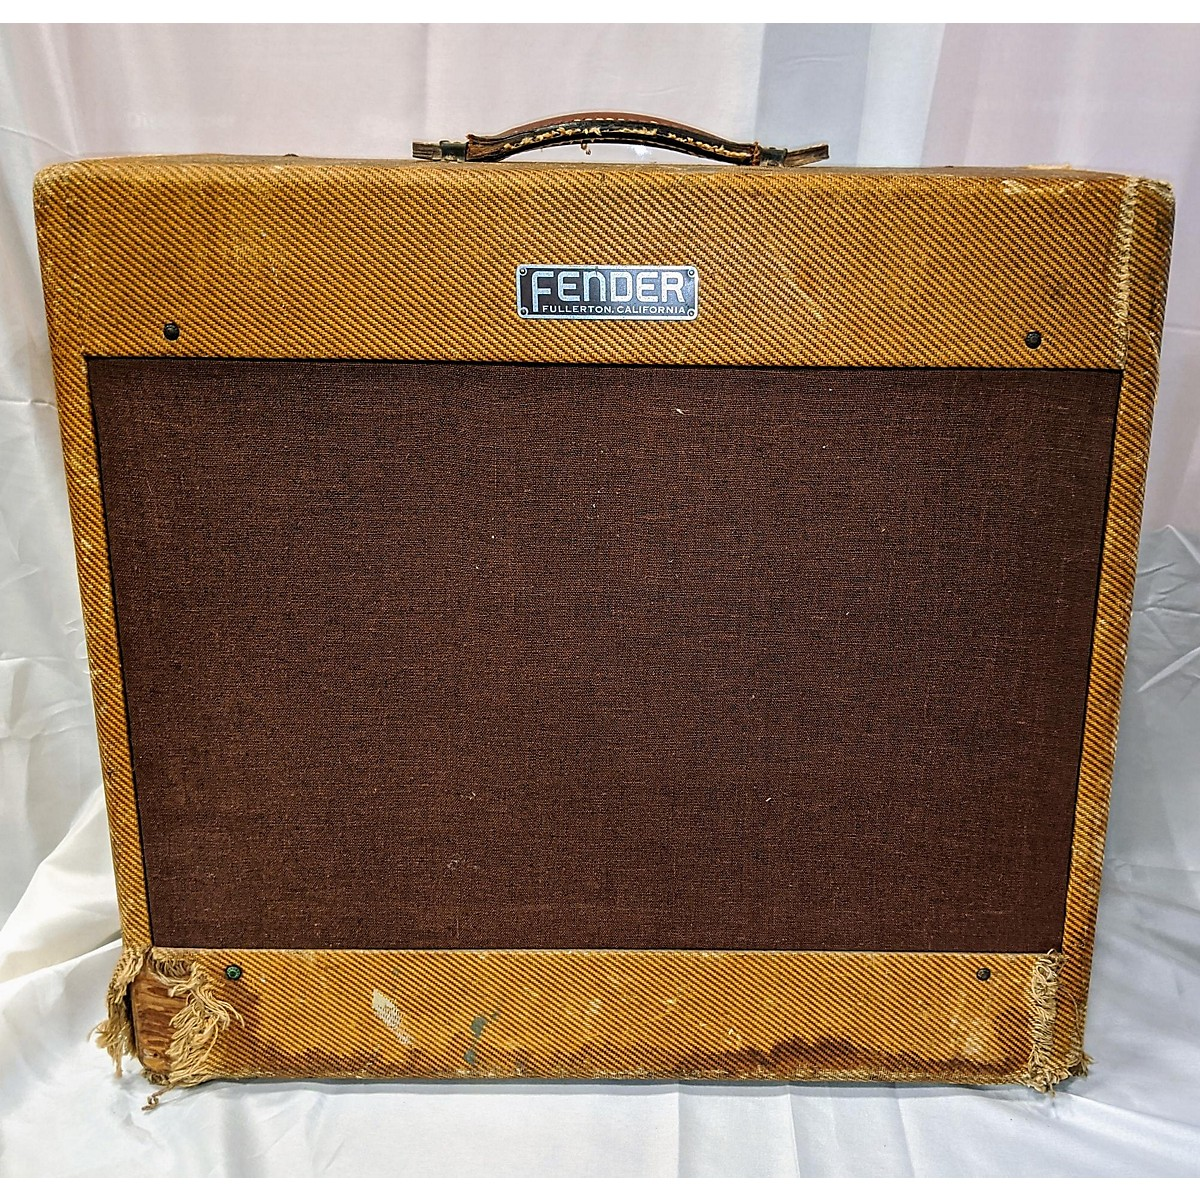 Fender 1954 1954 PRO TWEED Tube Guitar Combo Amp